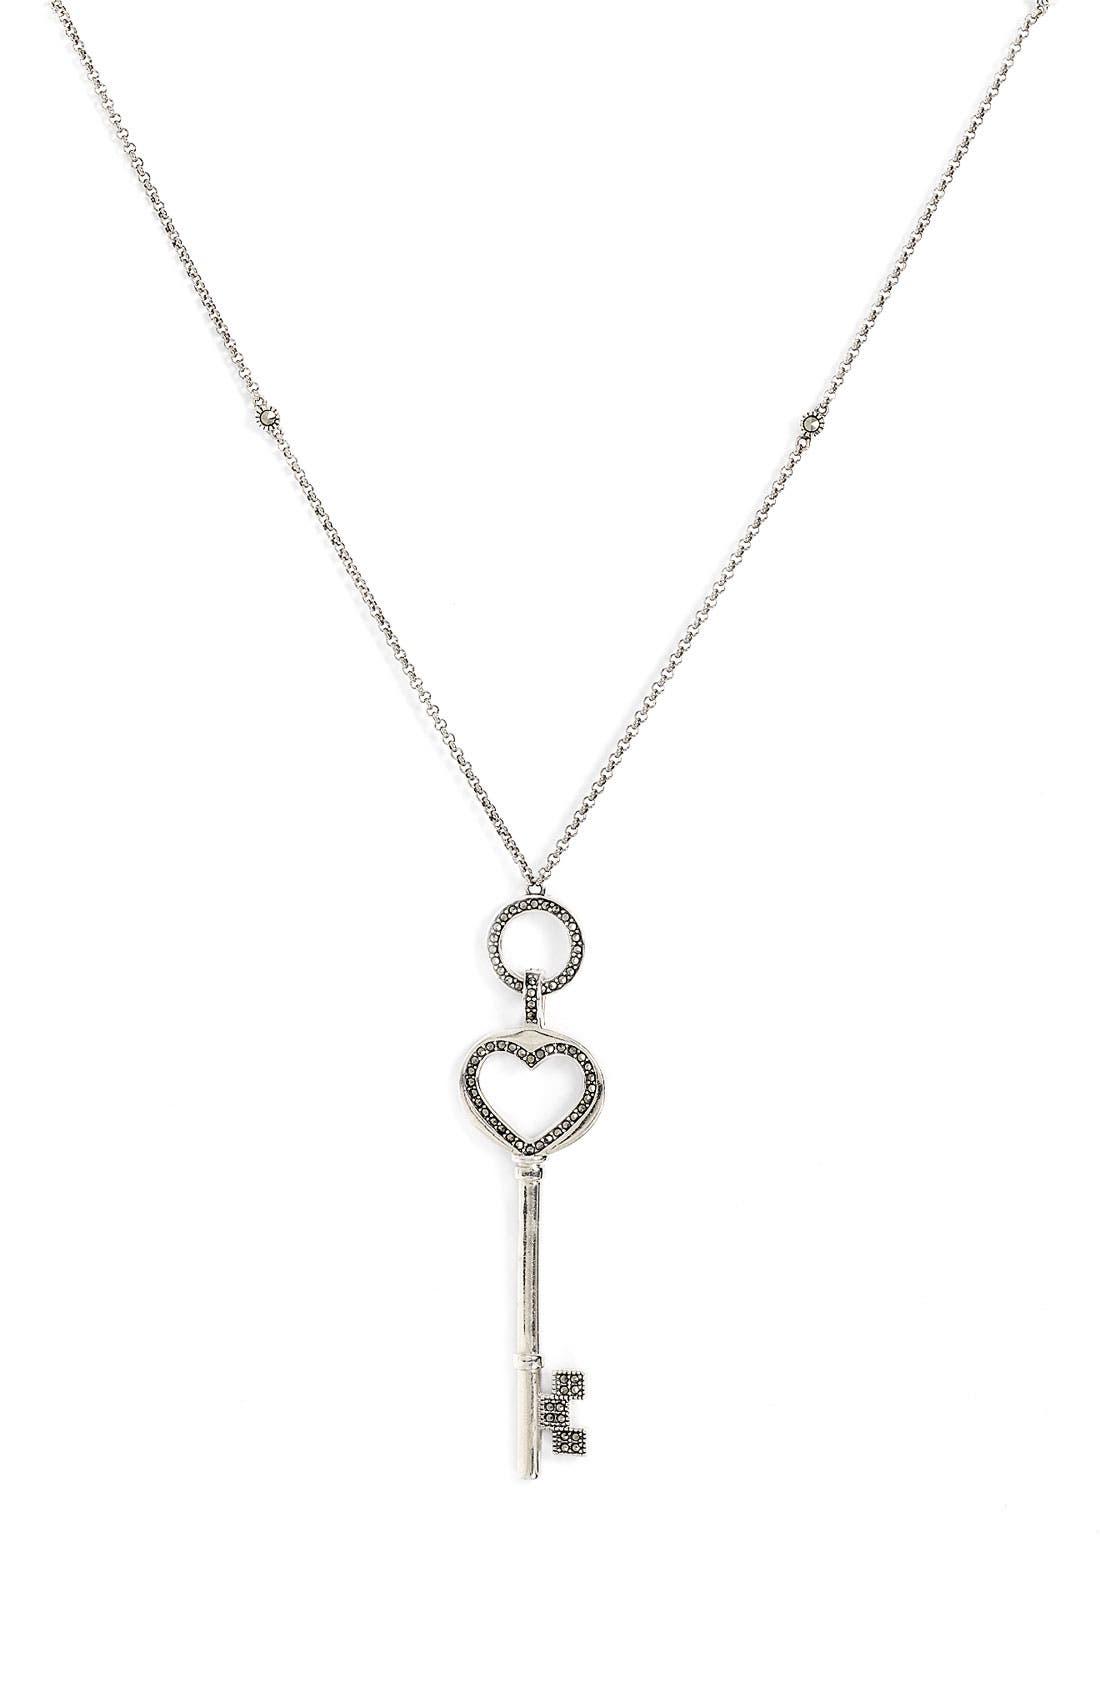 Main Image - Judith Jack Key Convertible Necklace